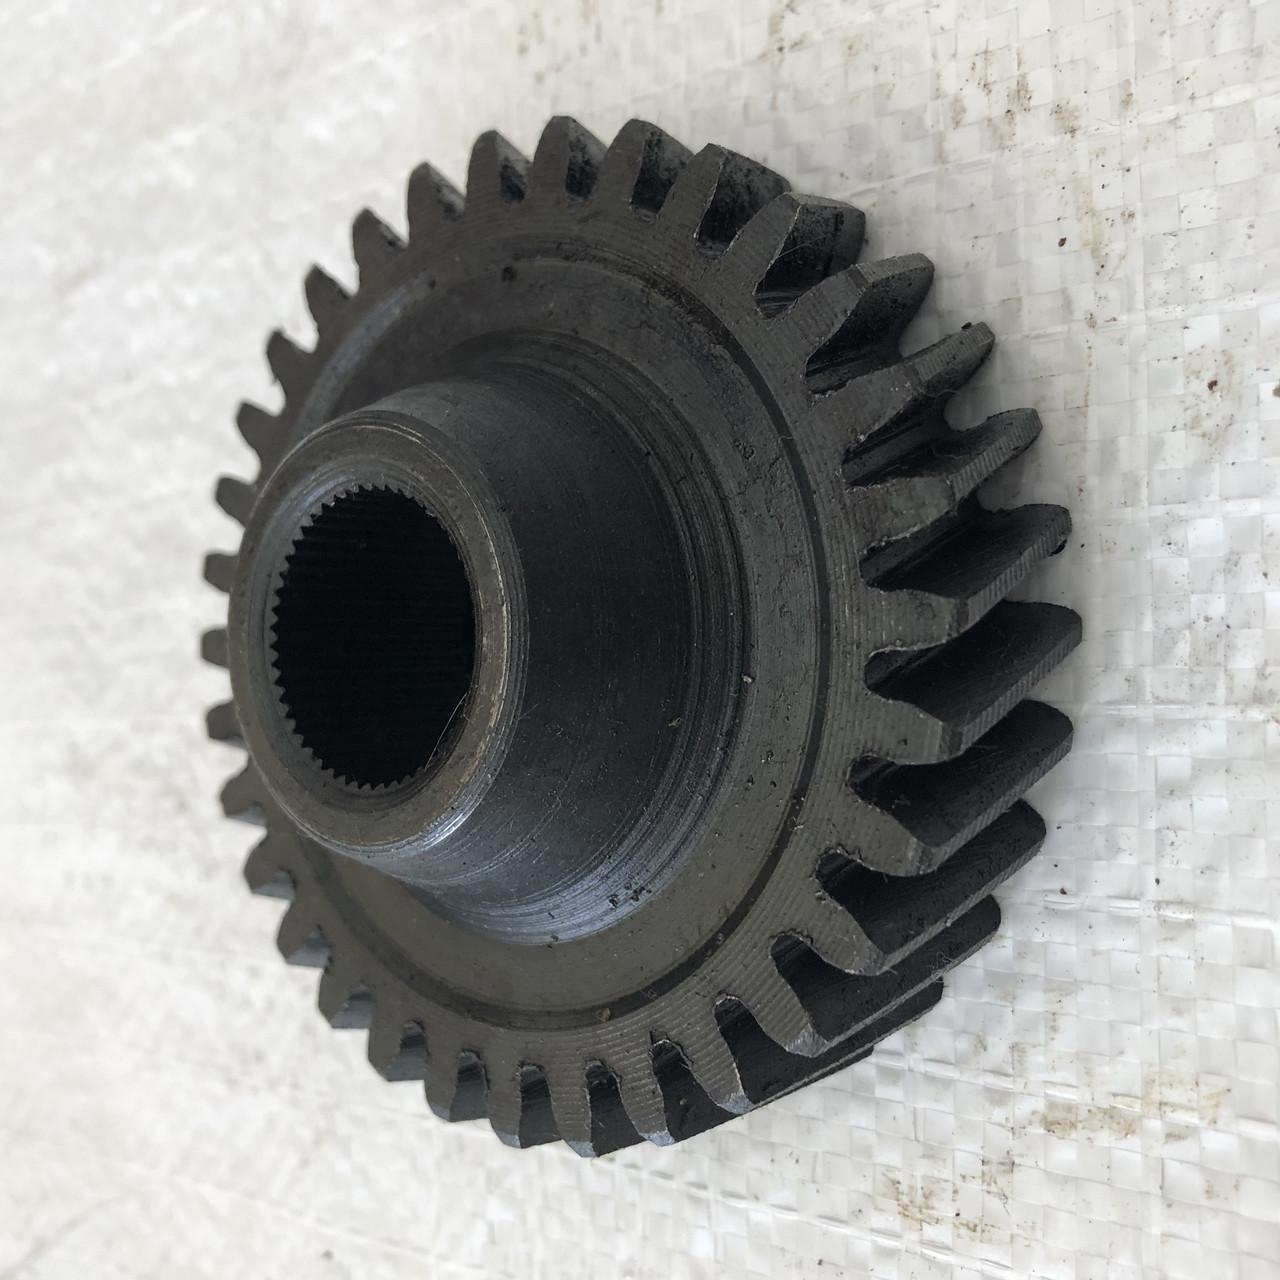 Шестерня привода вентилятора 236-1308104-Б2 двигателя ЯМЗ 236,ЯМЗ-236М2,ЯМЗ 236Д,ЯМЗ 238М